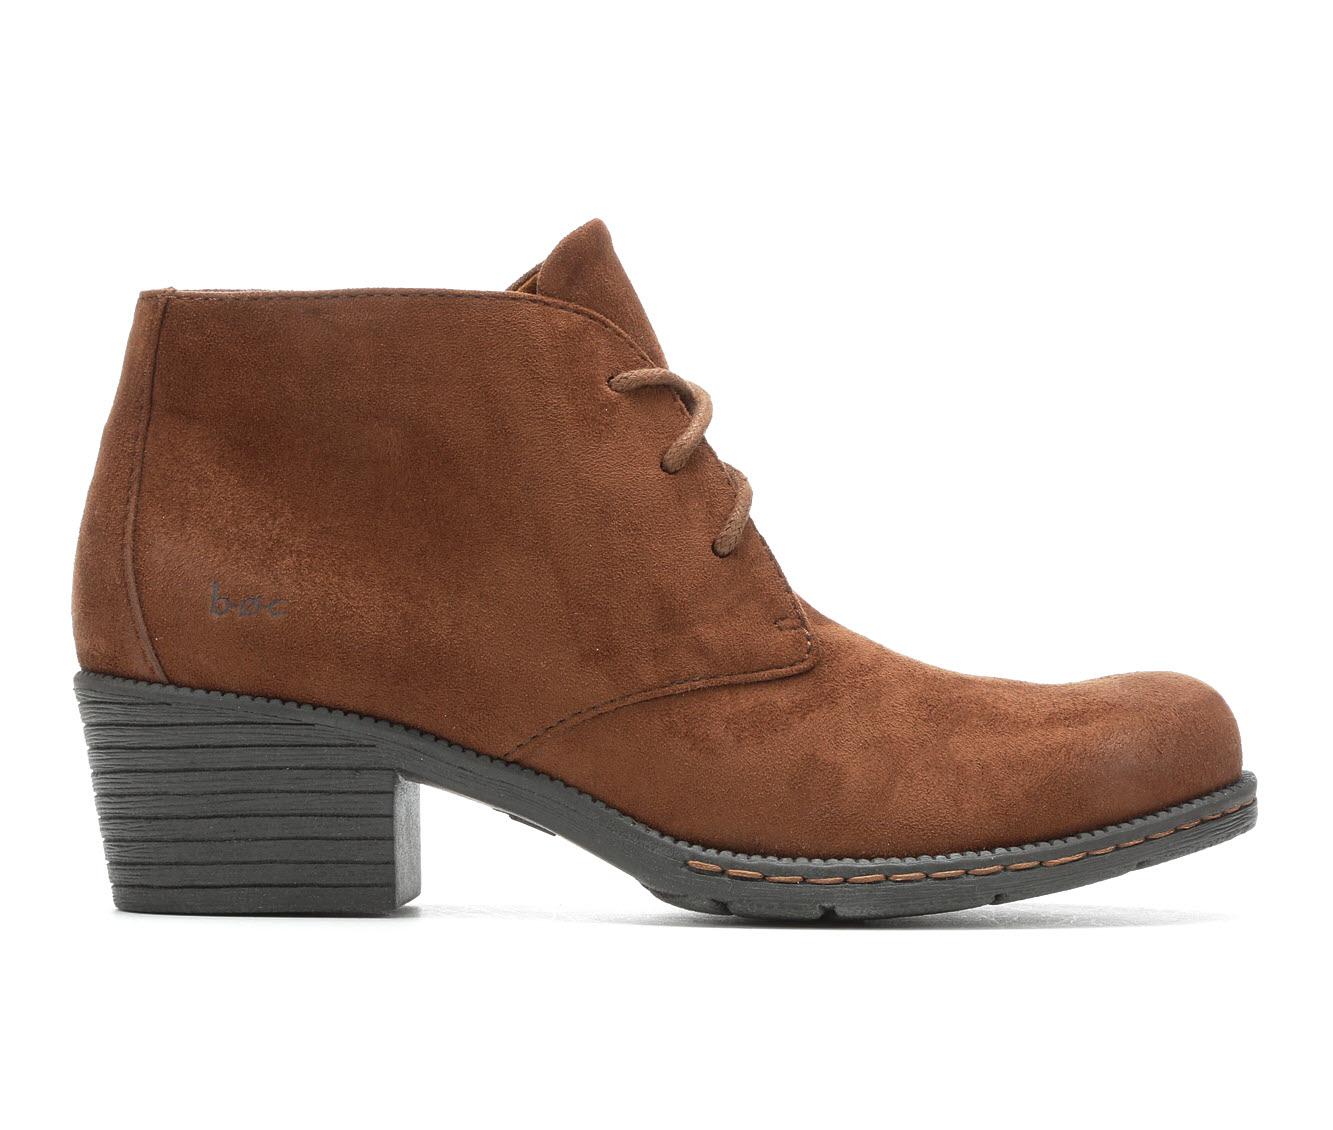 B.O.C. Leyburn Women's Boots (Brown - Canvas)